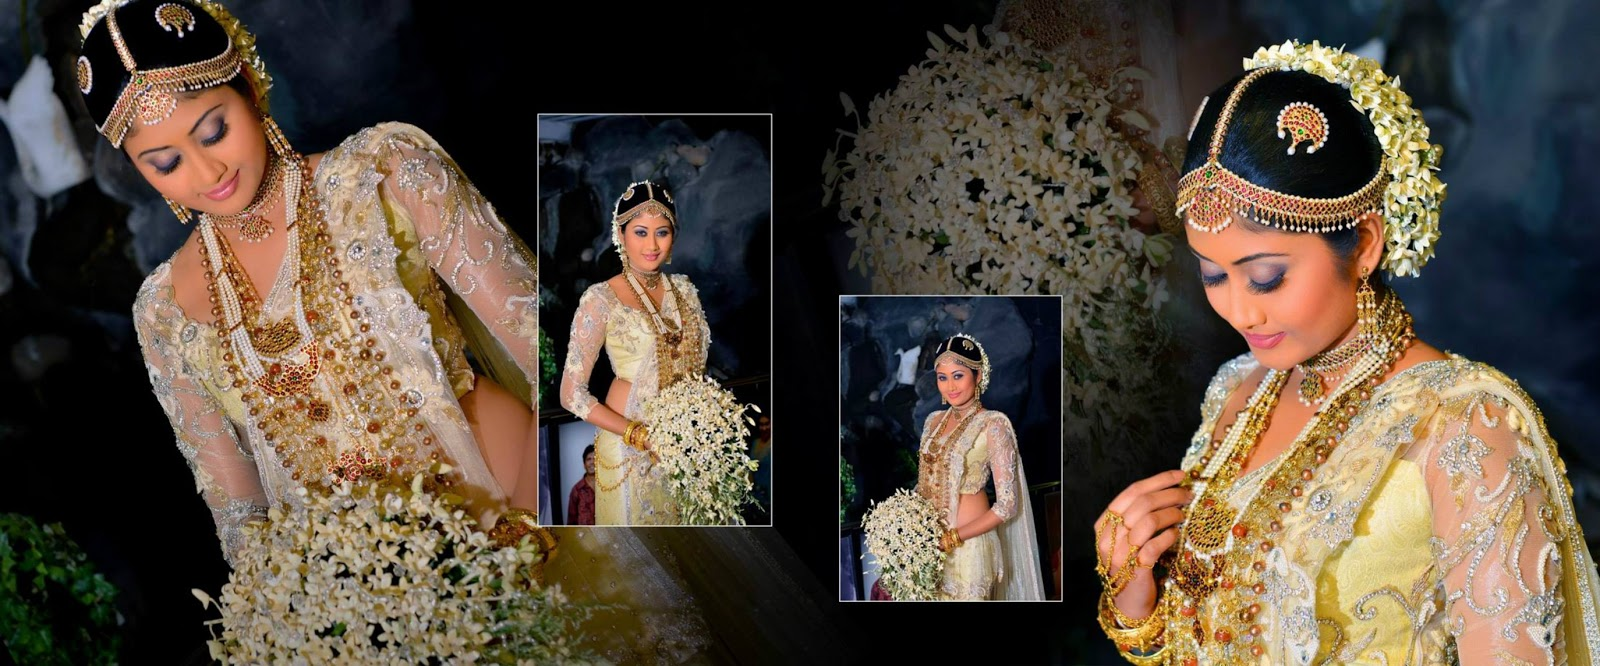 Karina Vlad Model Y 107: Srilanka Hot Model